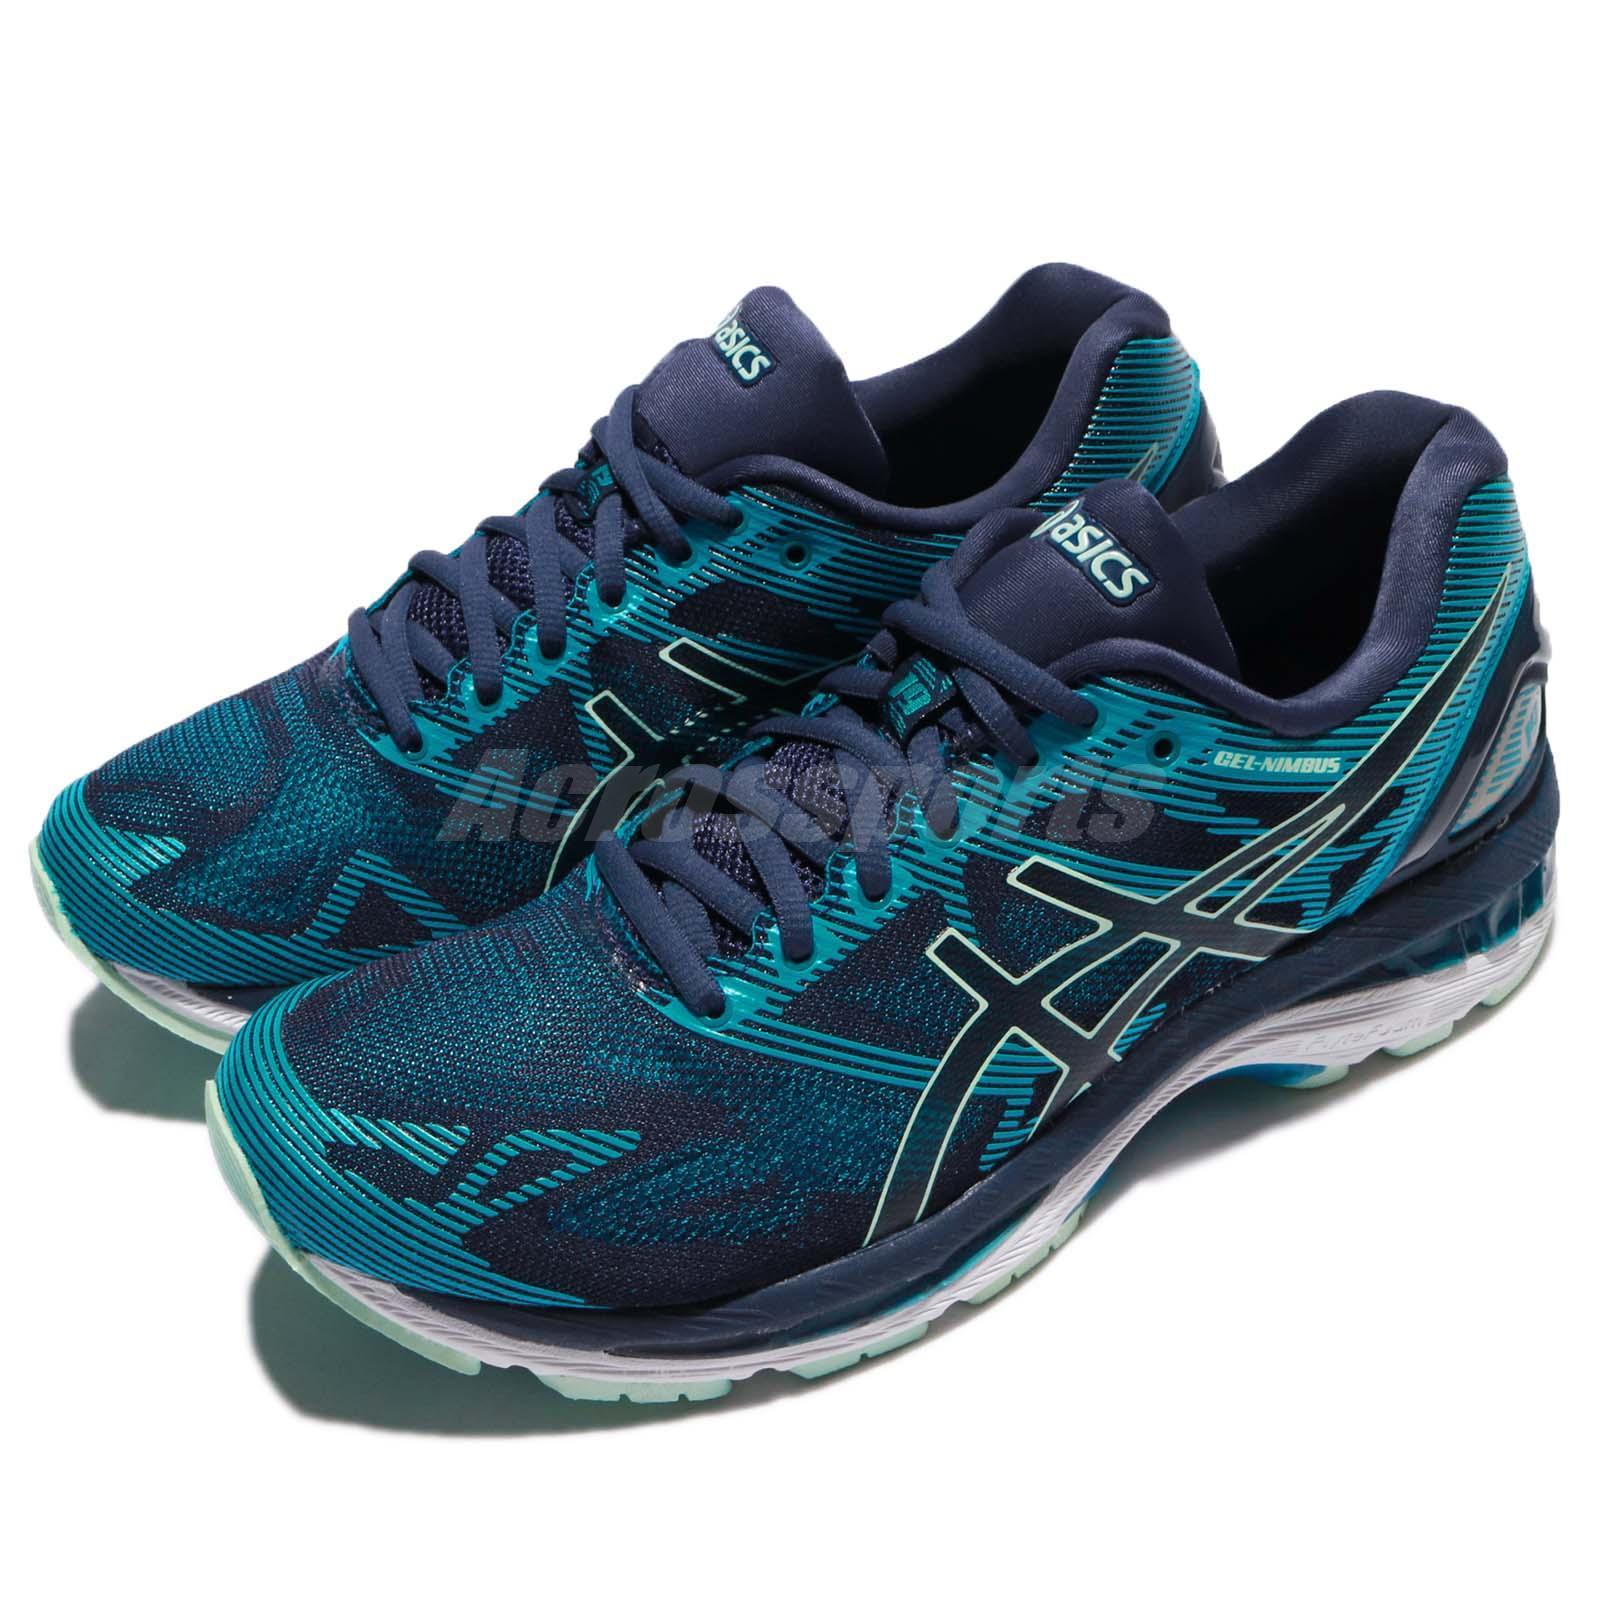 best website 996e6 5f04d Details about Asics Gel-Nimbus 19 Insignia Blue Glacier Sea Women Running  Shoes T750N-5067